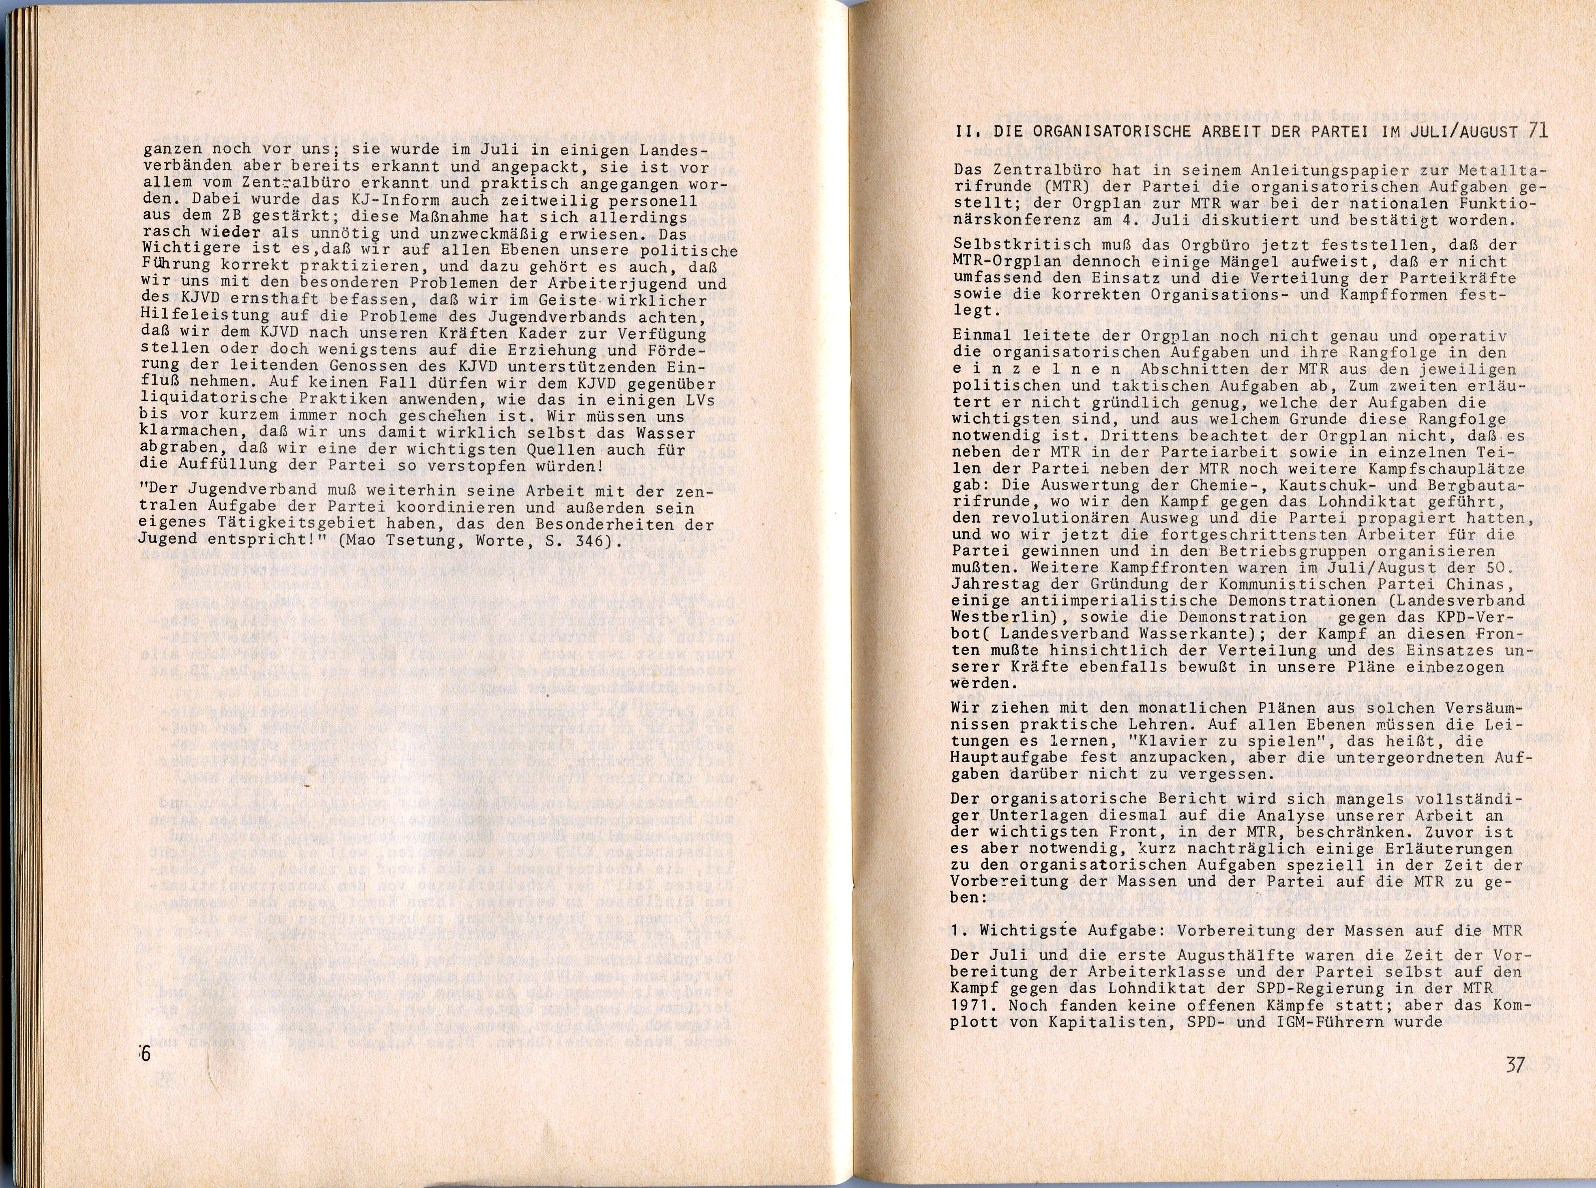 ZB_Parteiarbeiter_1971_07_20